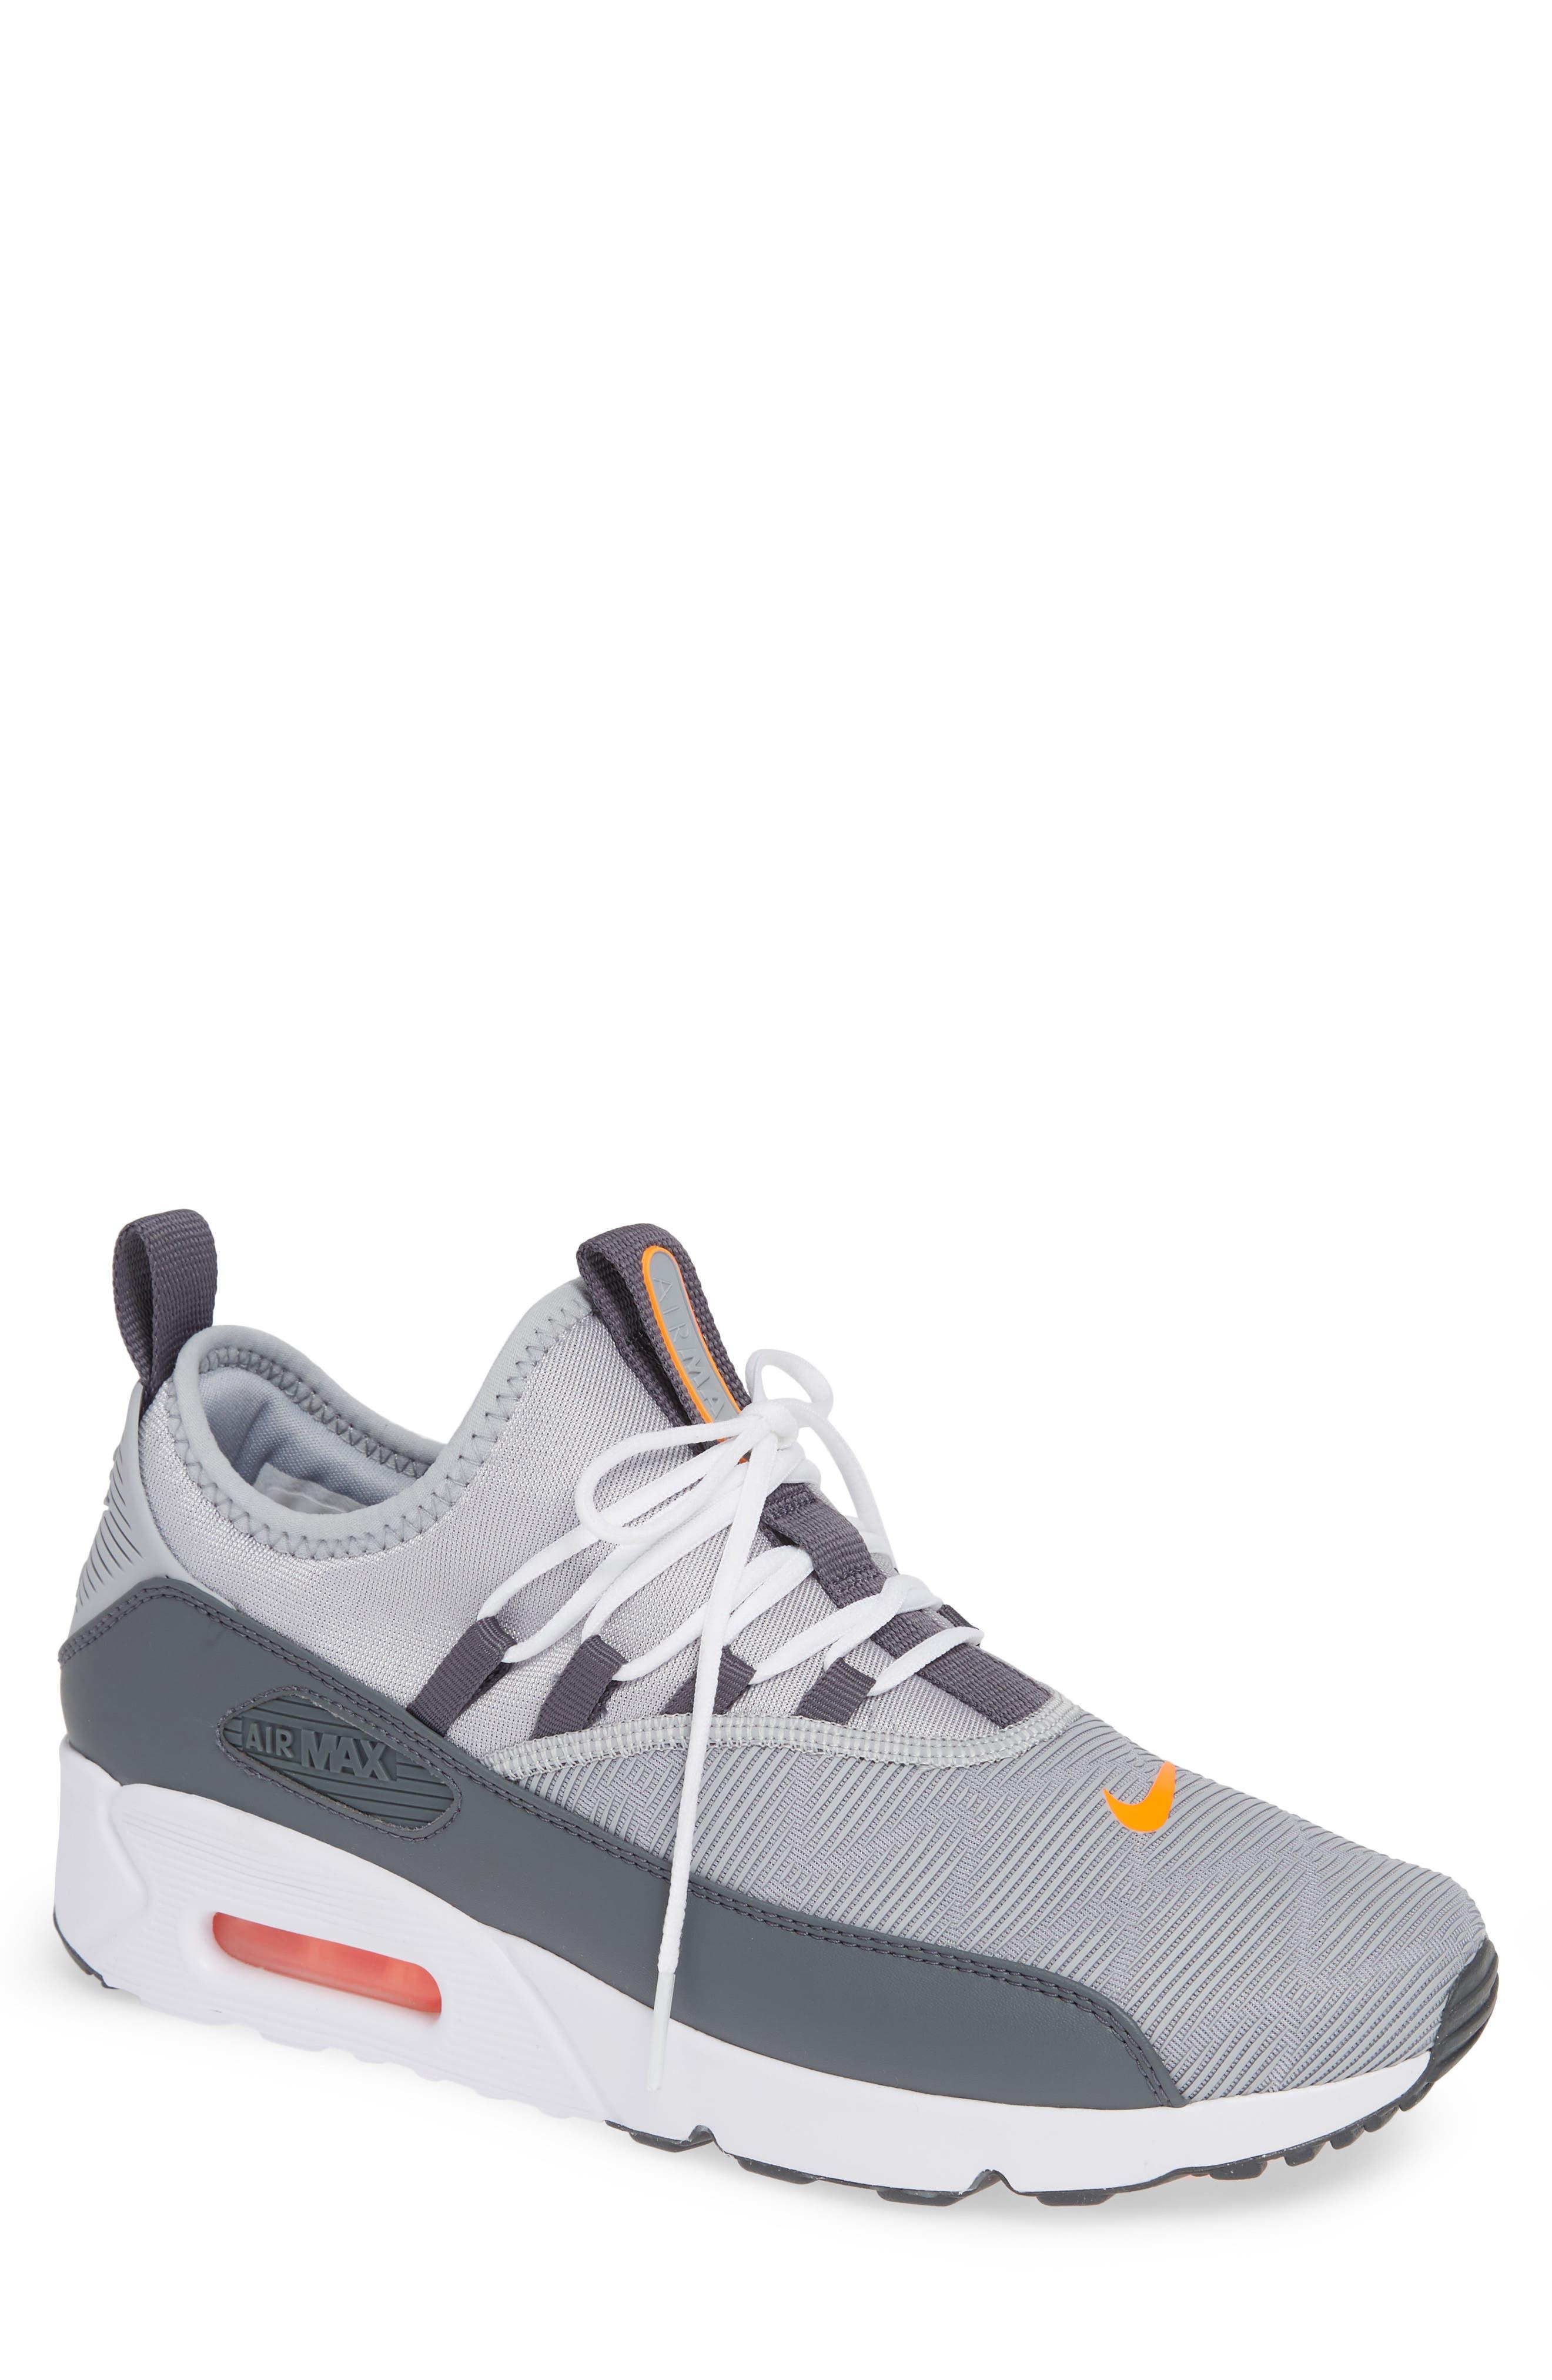 Air Max 90 EZ Sneaker,                             Main thumbnail 1, color,                             WOLF GREY/ TOTAL ORANGE/ WHITE